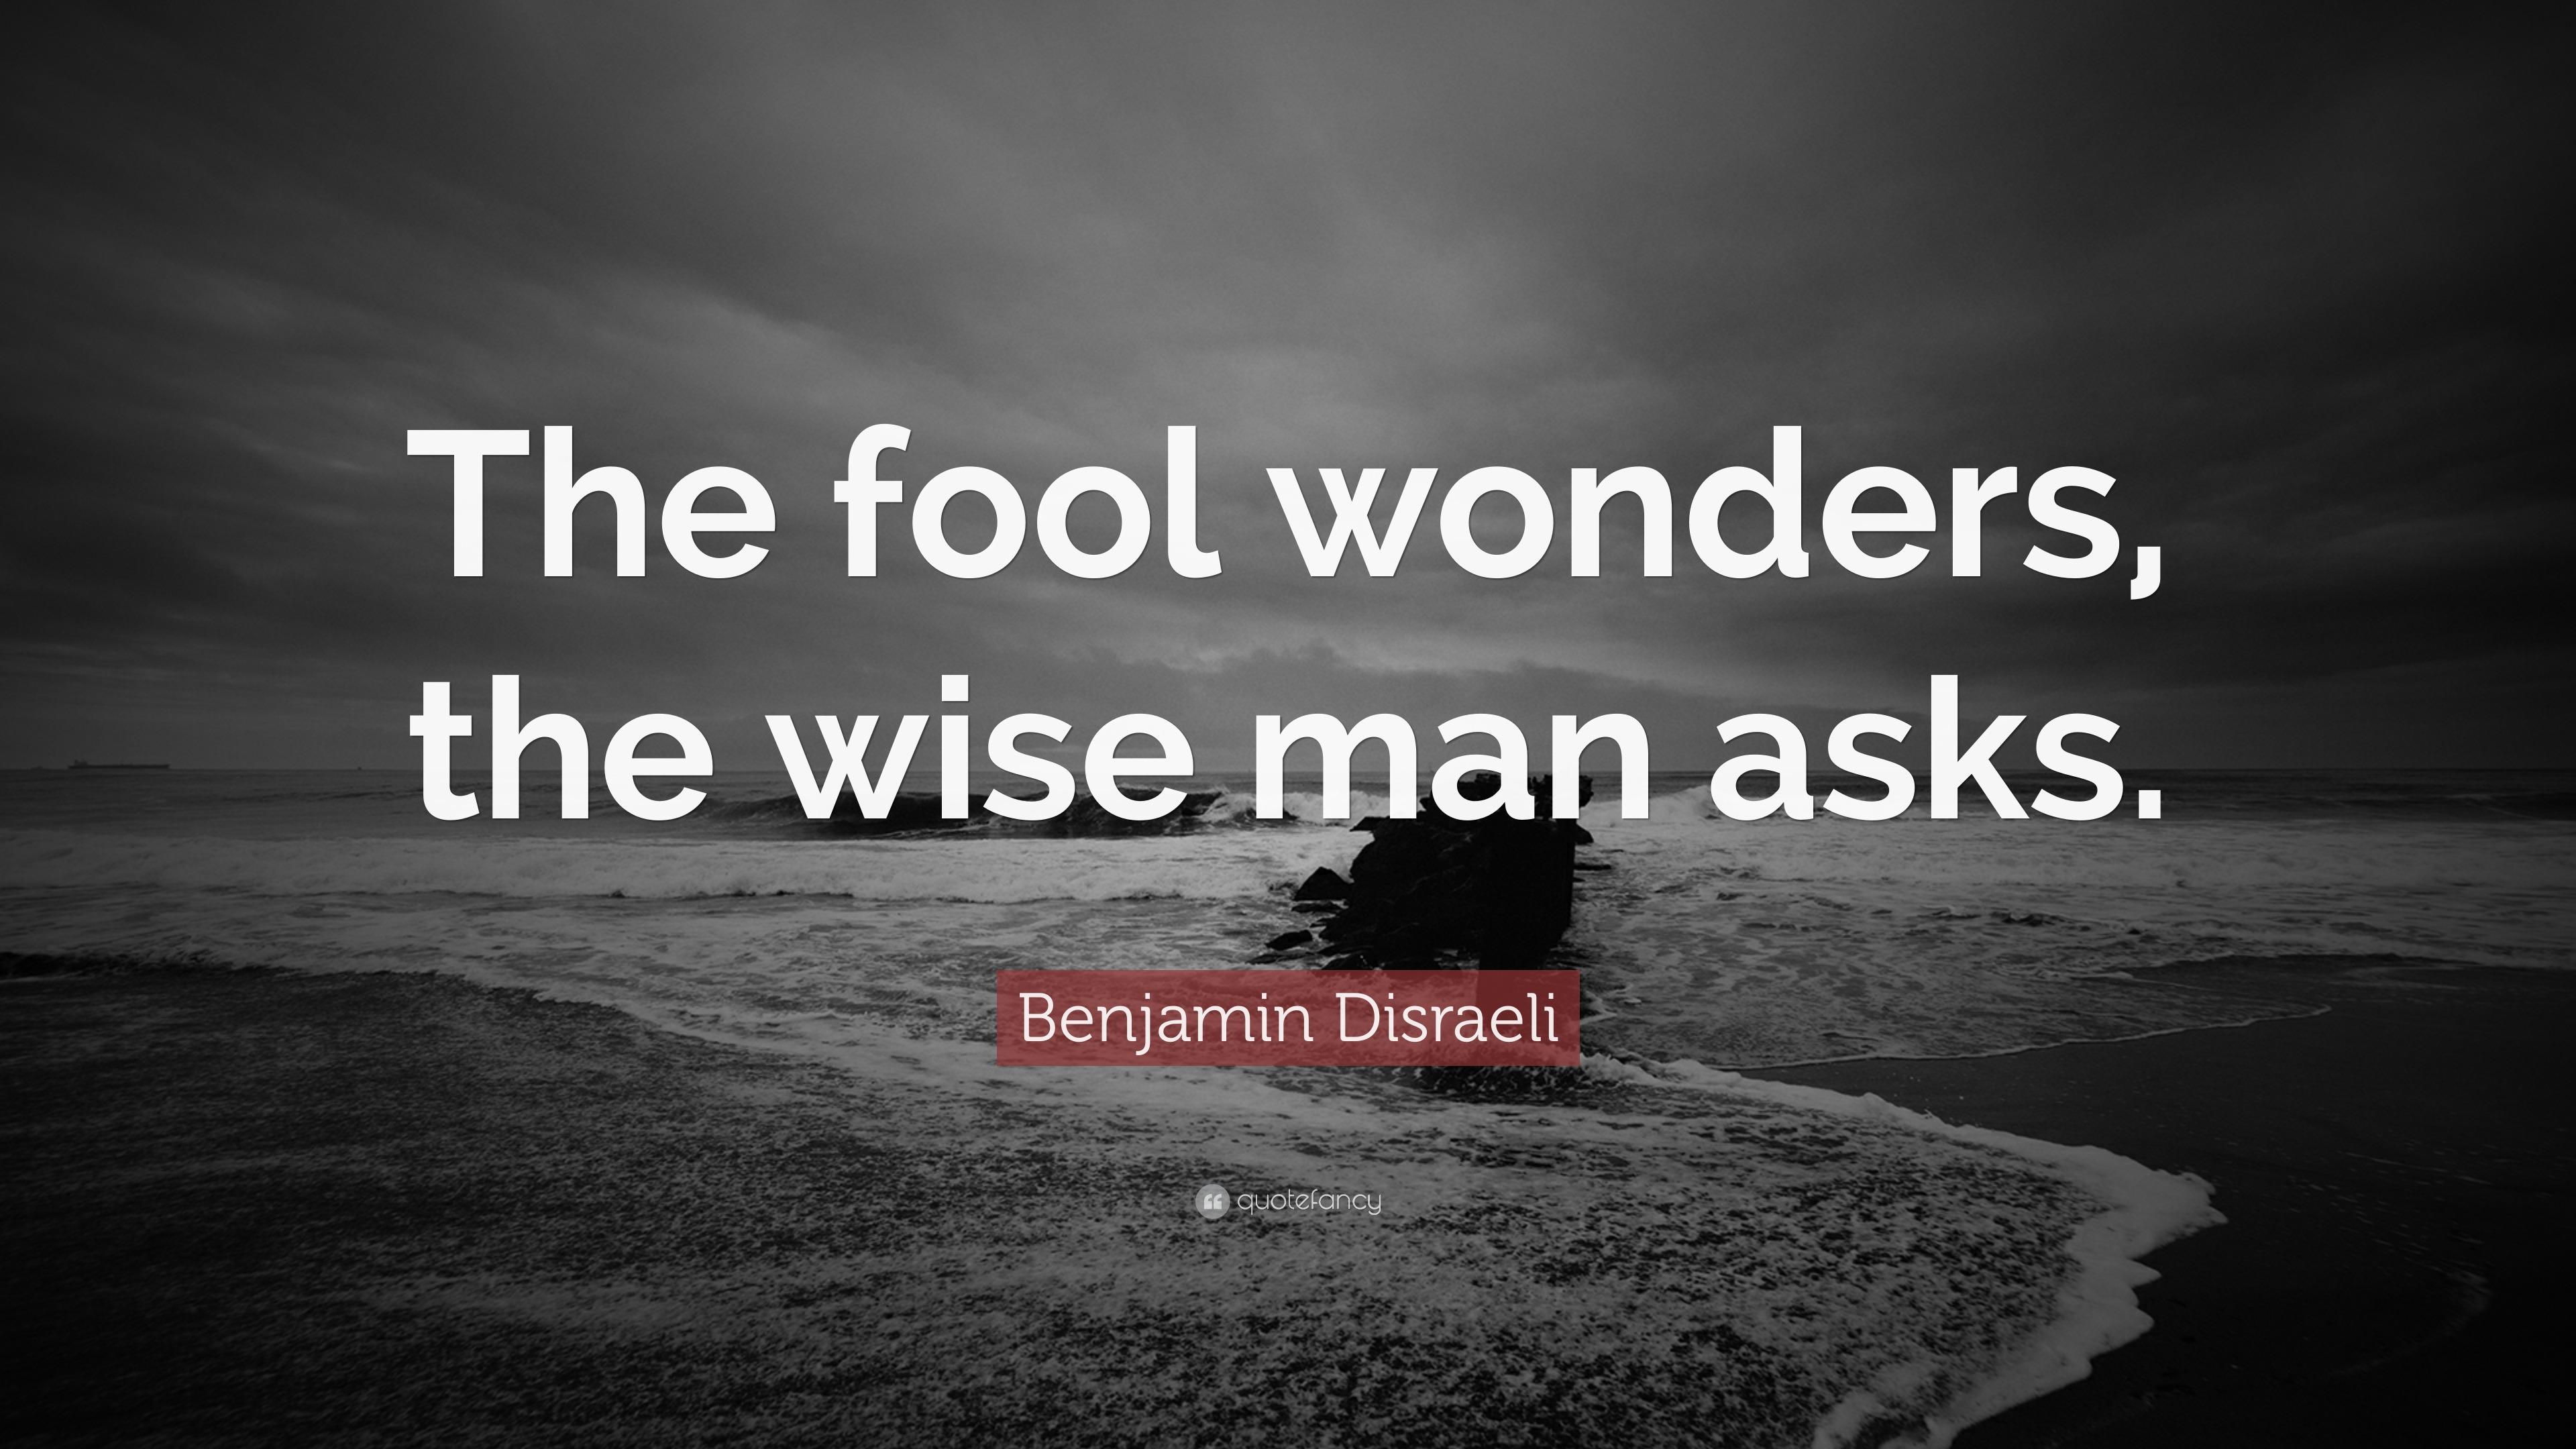 Benjamin Disraeli Quote The Fool Wonders The Wise Man Asks 12